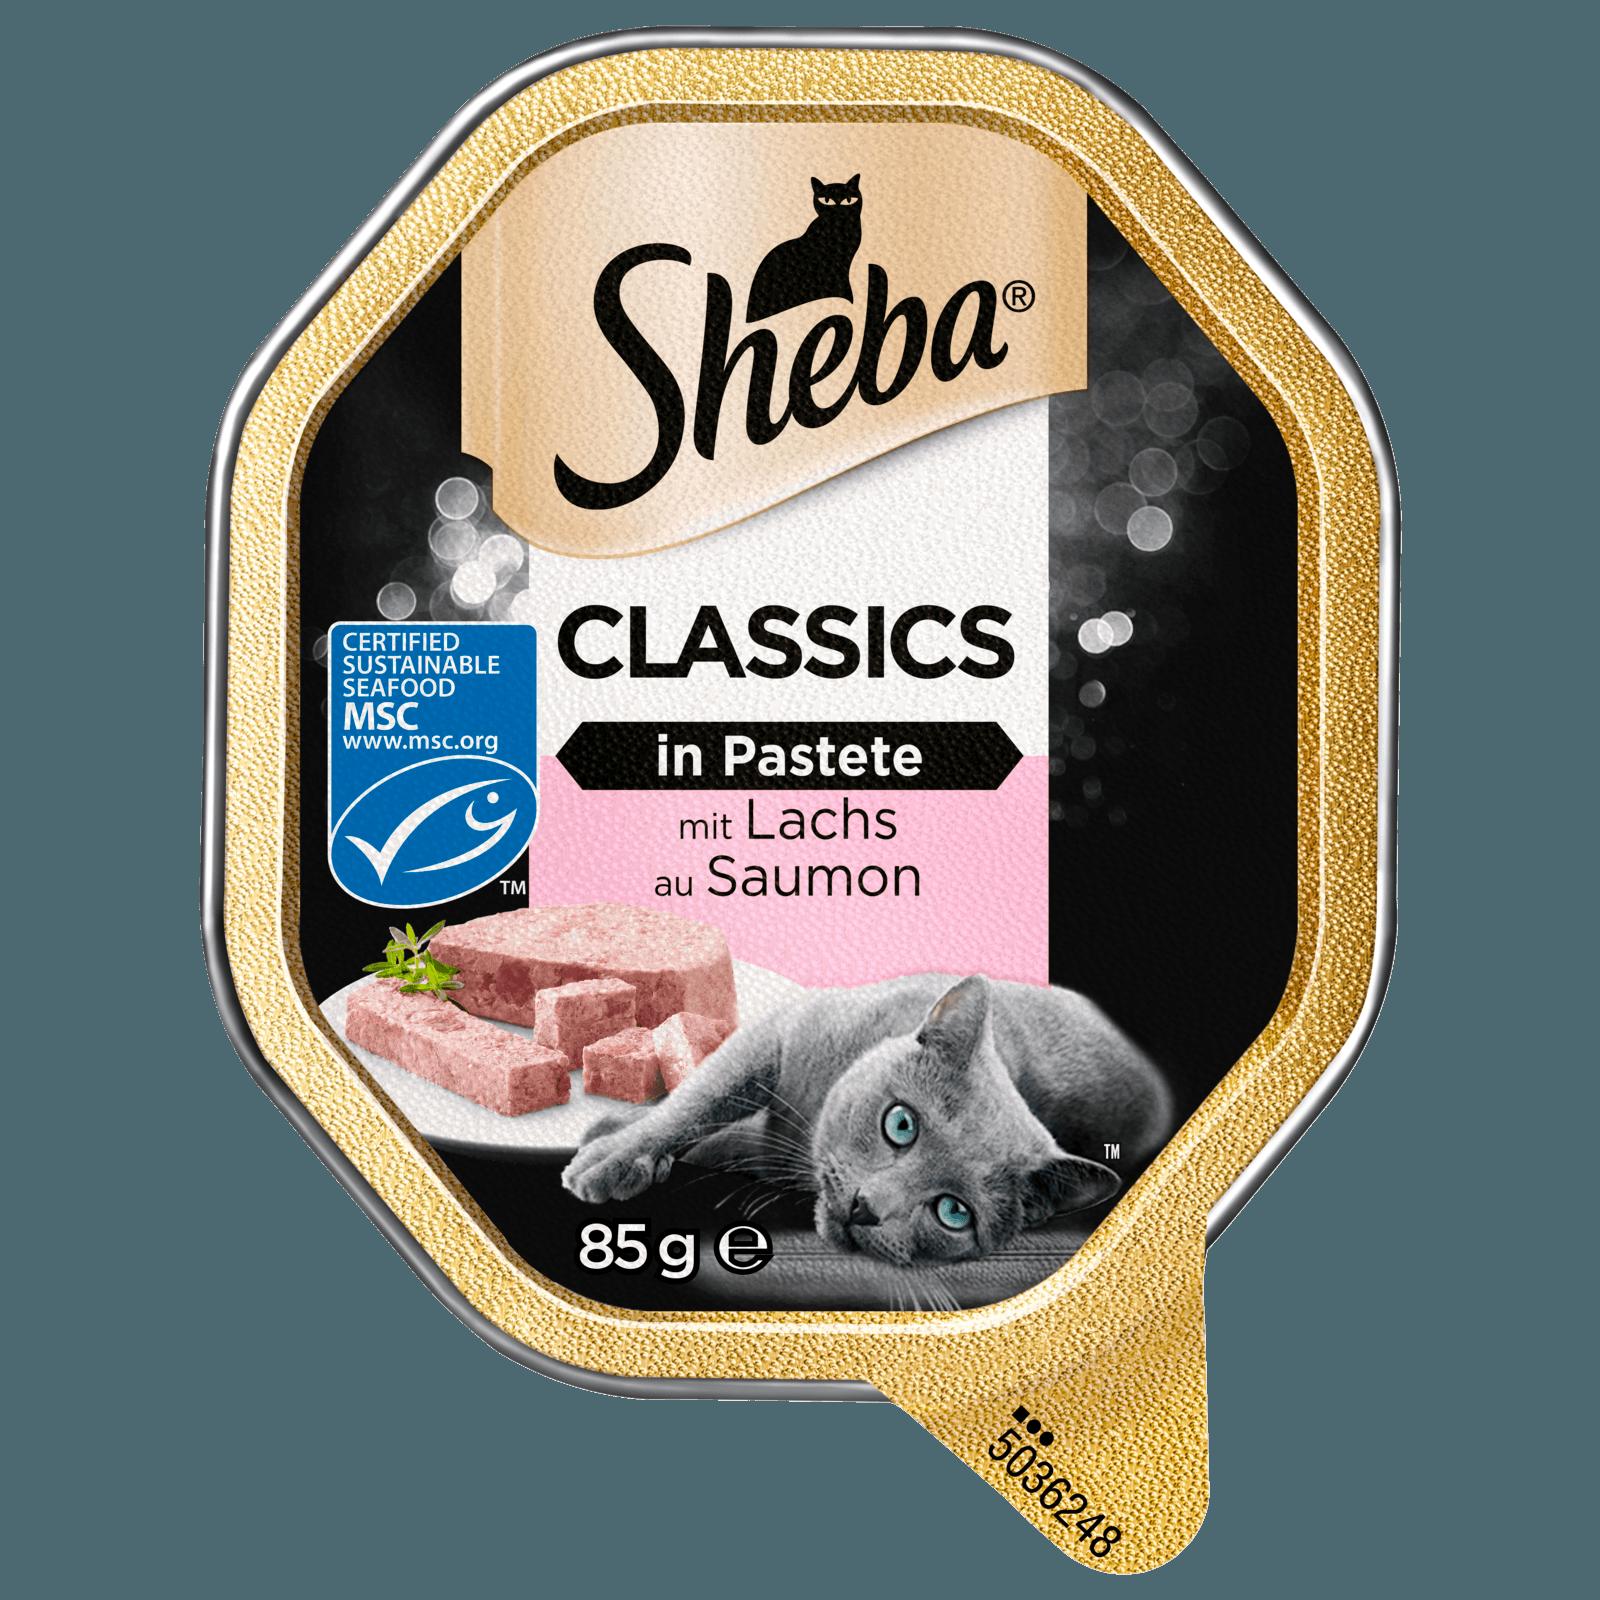 Sheba Katzenfutter Classics in Pastete mit Lachs 85g